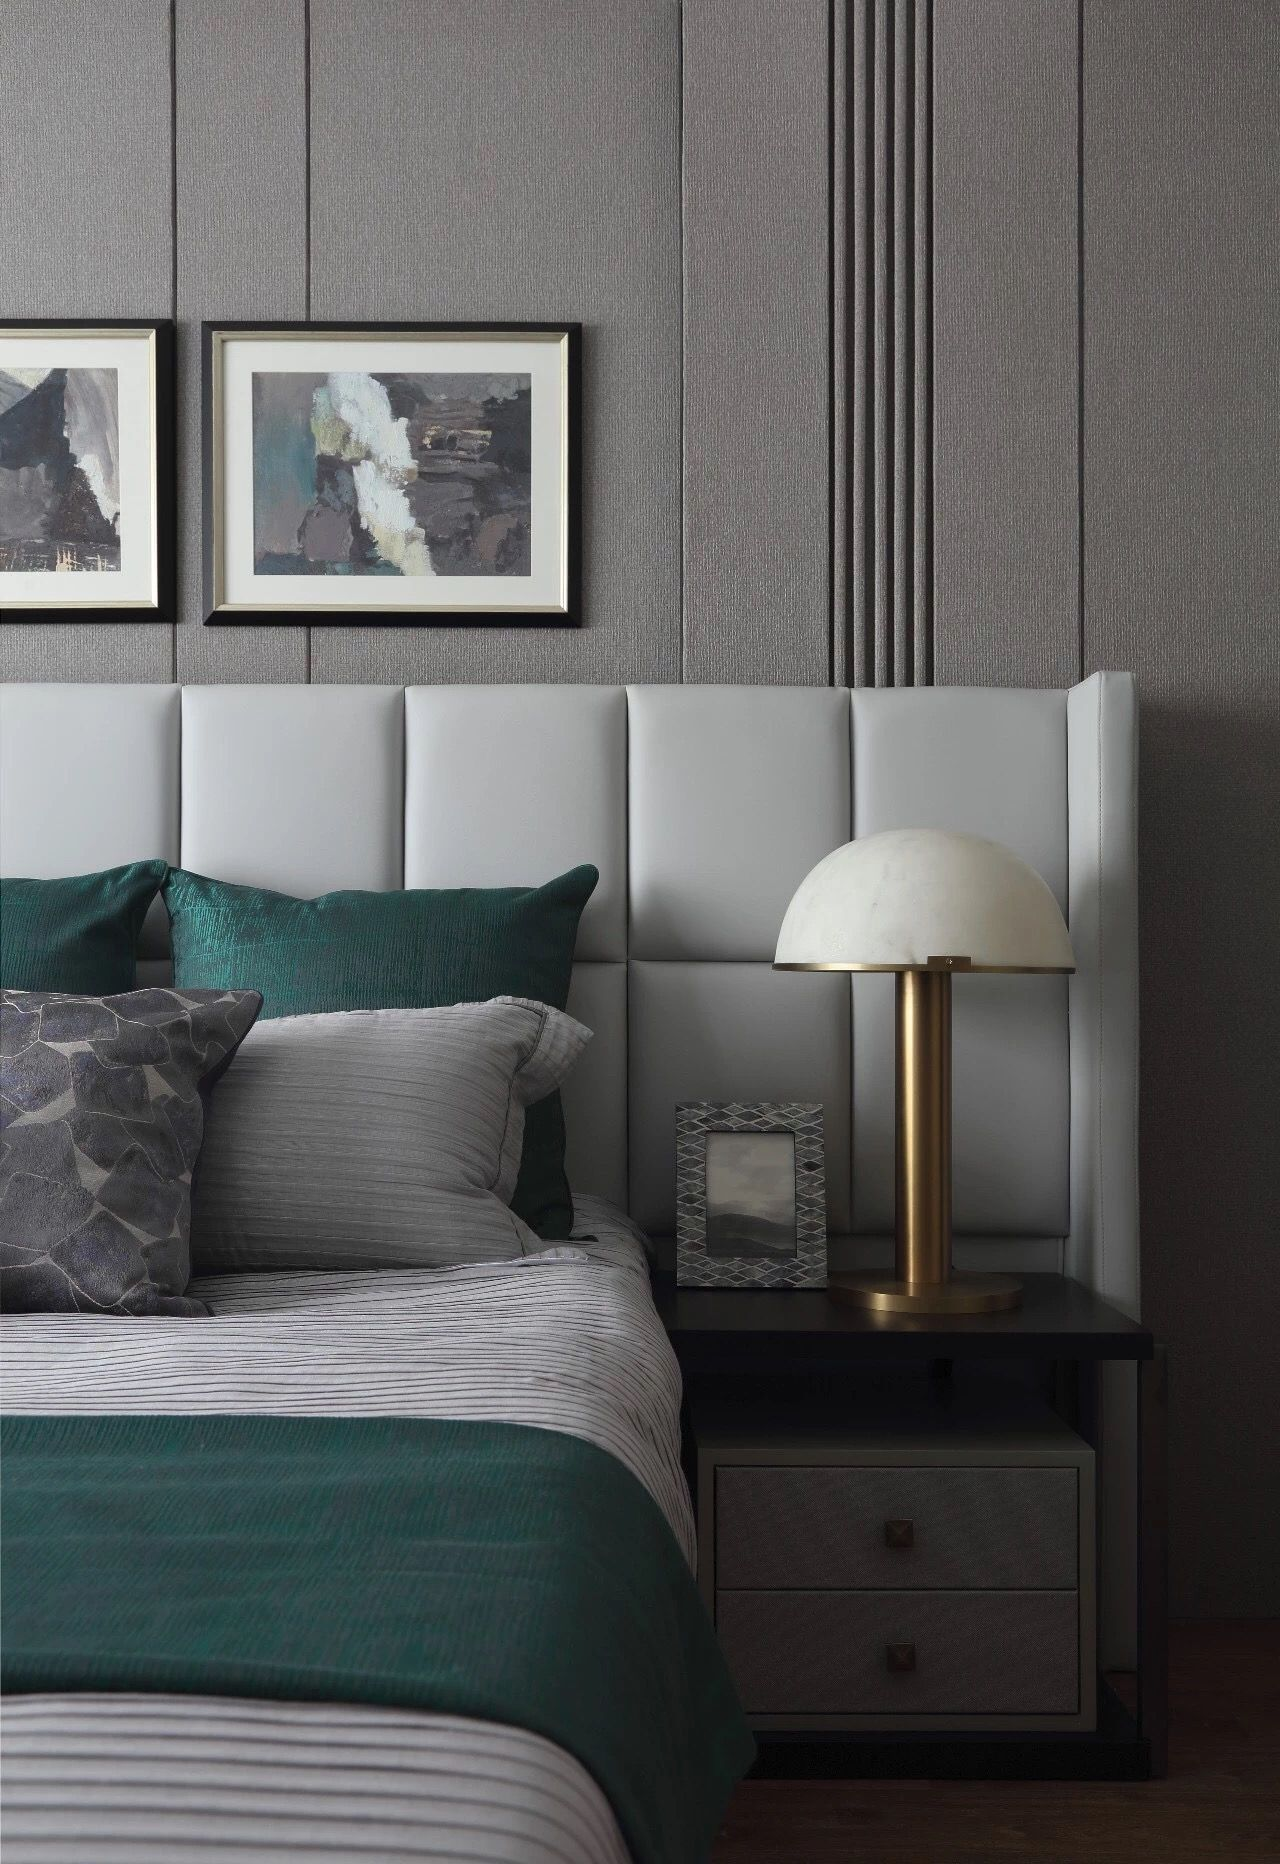 Decor De Chambres Salle De Bain Salon Salle A Manger Laissez Vous Inspirer Par Notre Modern Bedroom Furniture Contemporary Bedroom Design Bedroom Interior